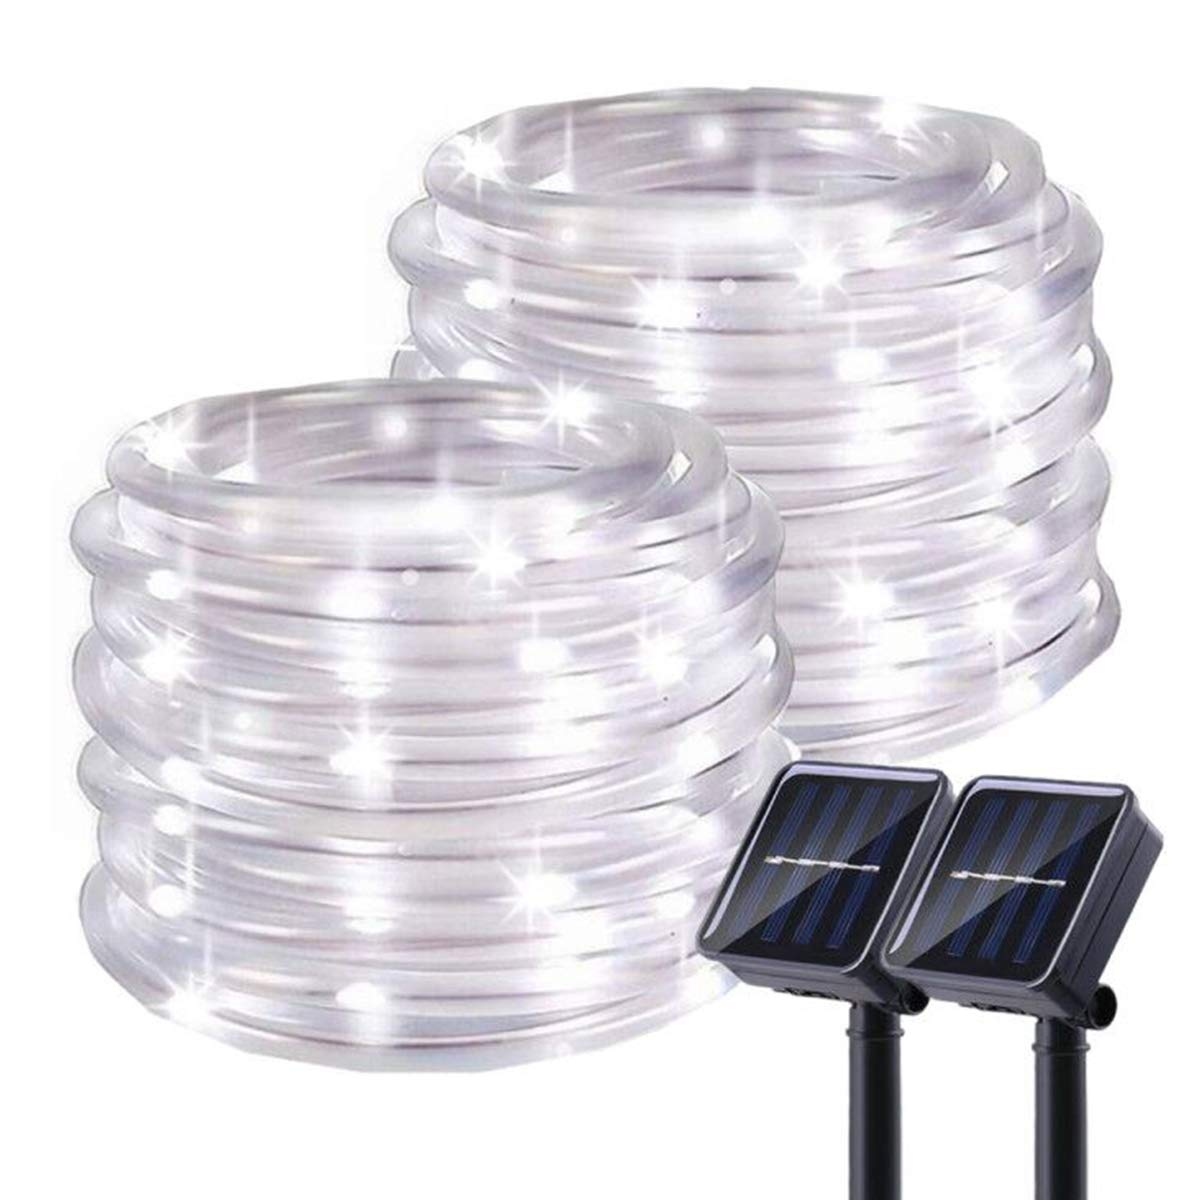 Outdoor Solar String Lights - 2 Pack Solar Rope Lights 100 LED